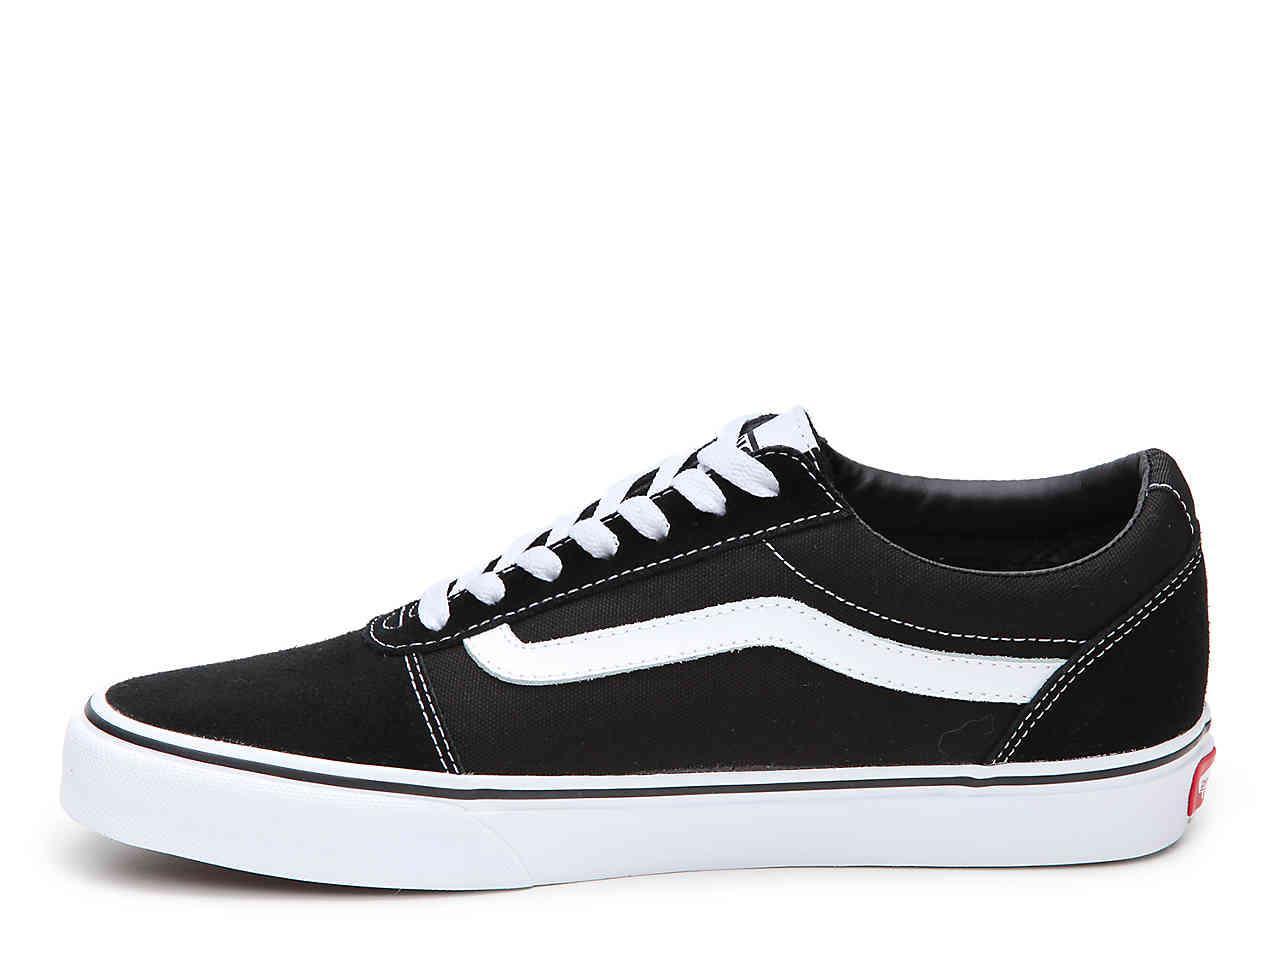 Vans Ward Lo Suede Sneaker in Black